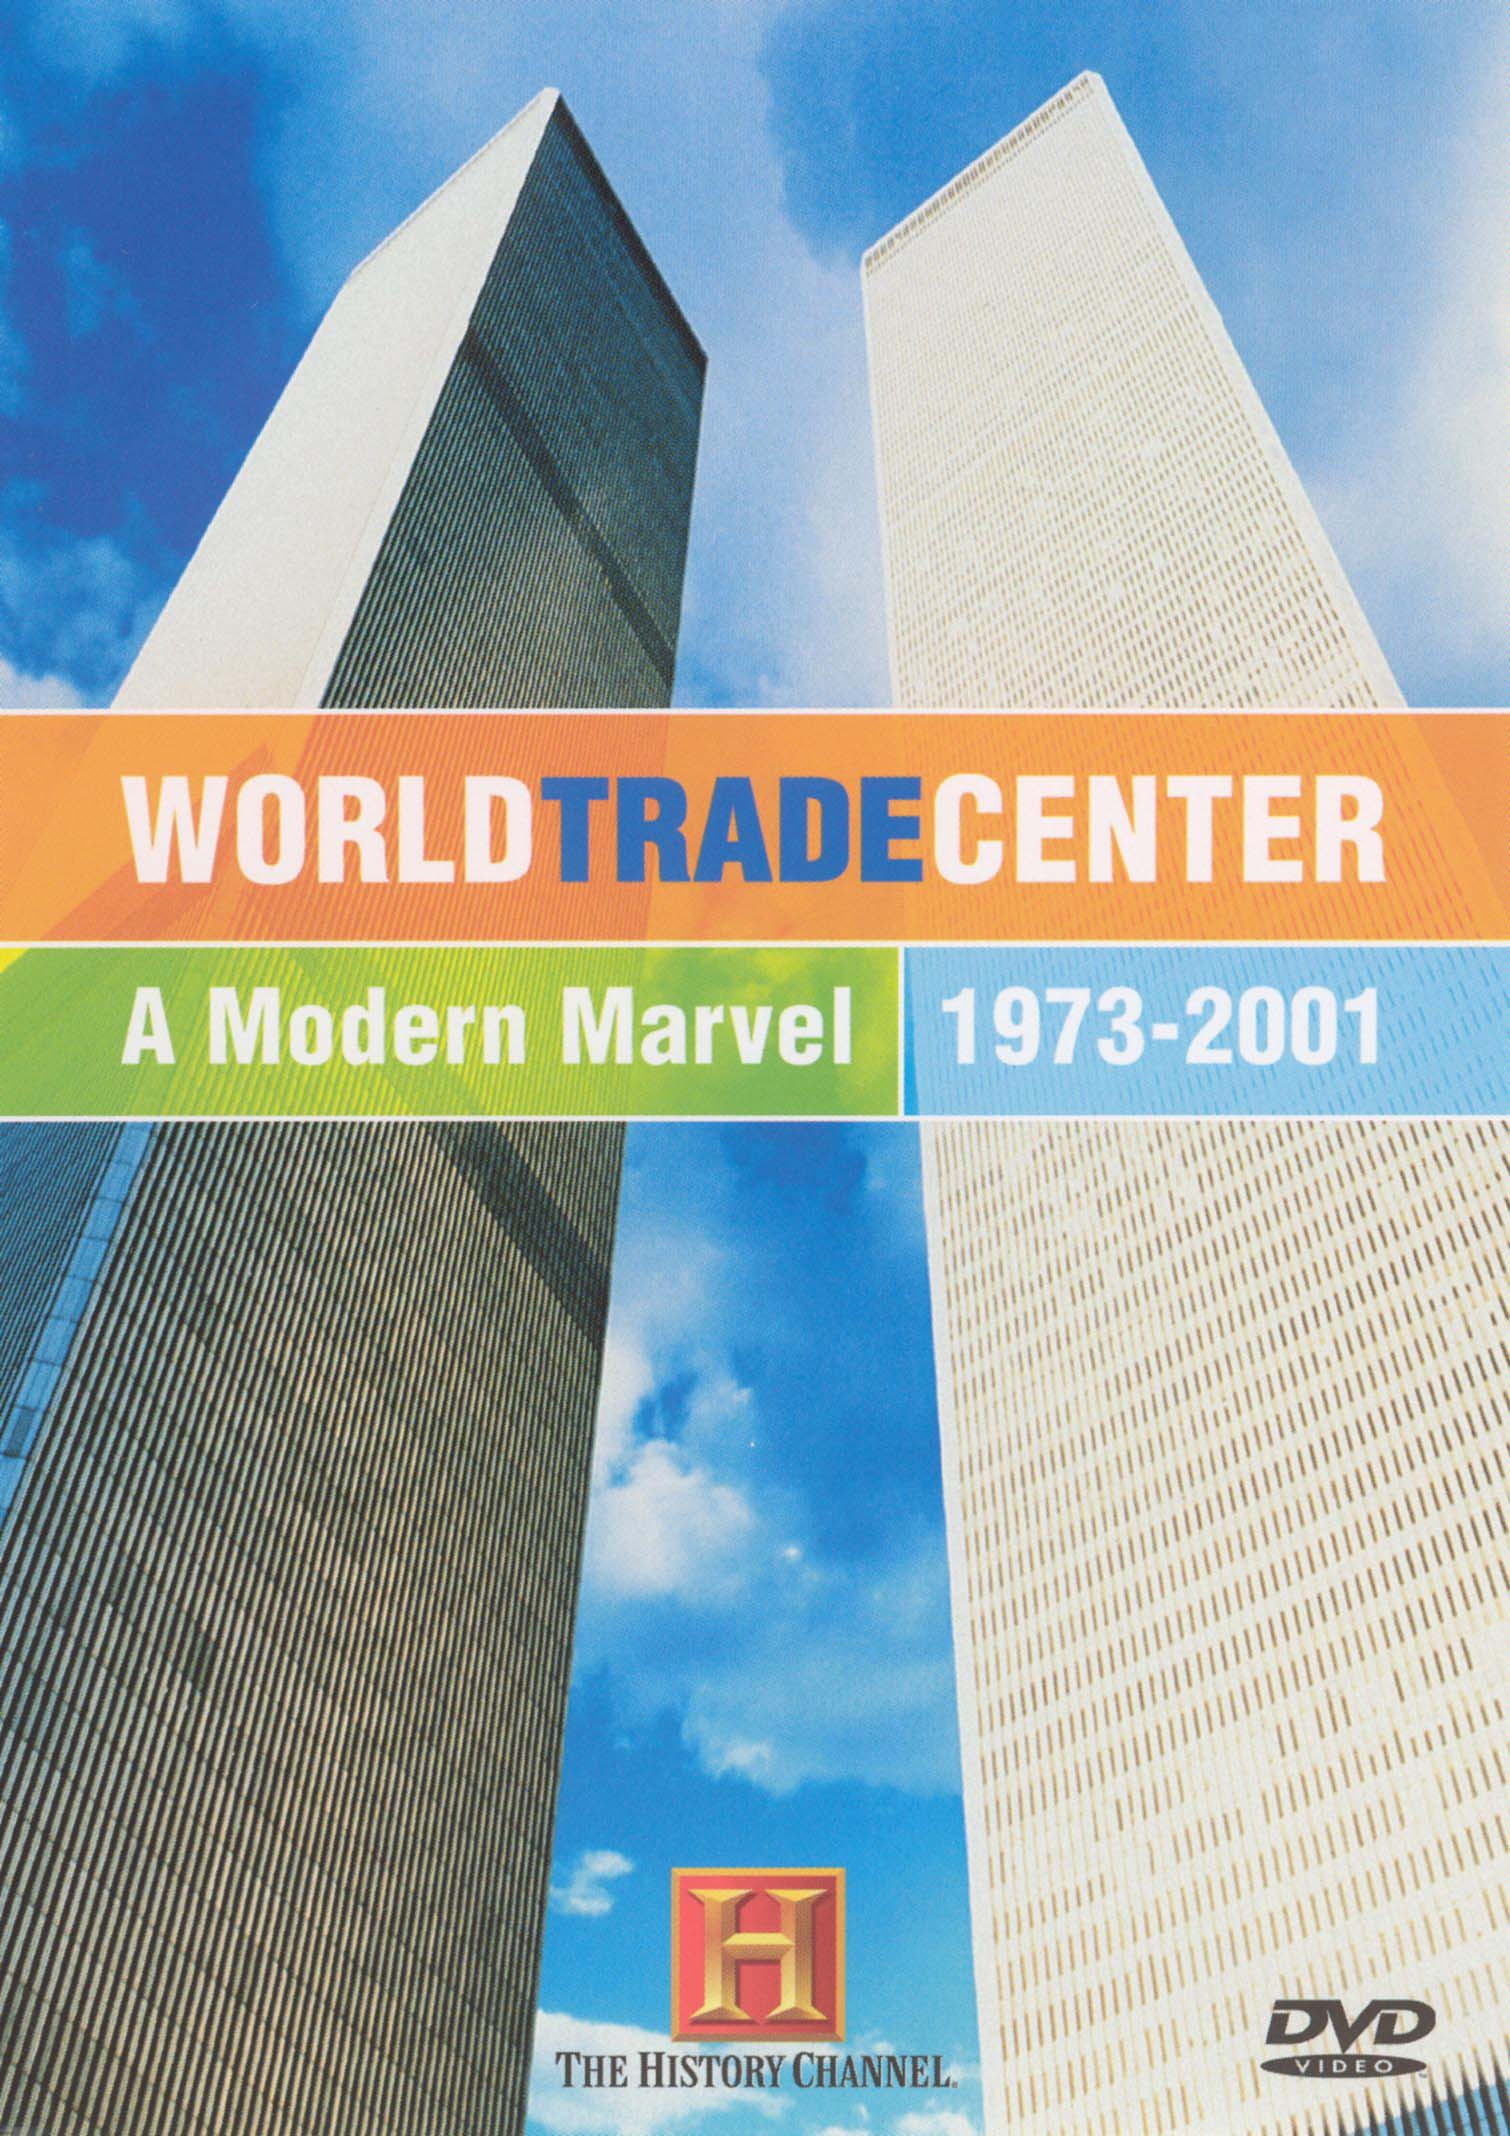 World Trade Center: A Modern Marvel 1973-2001